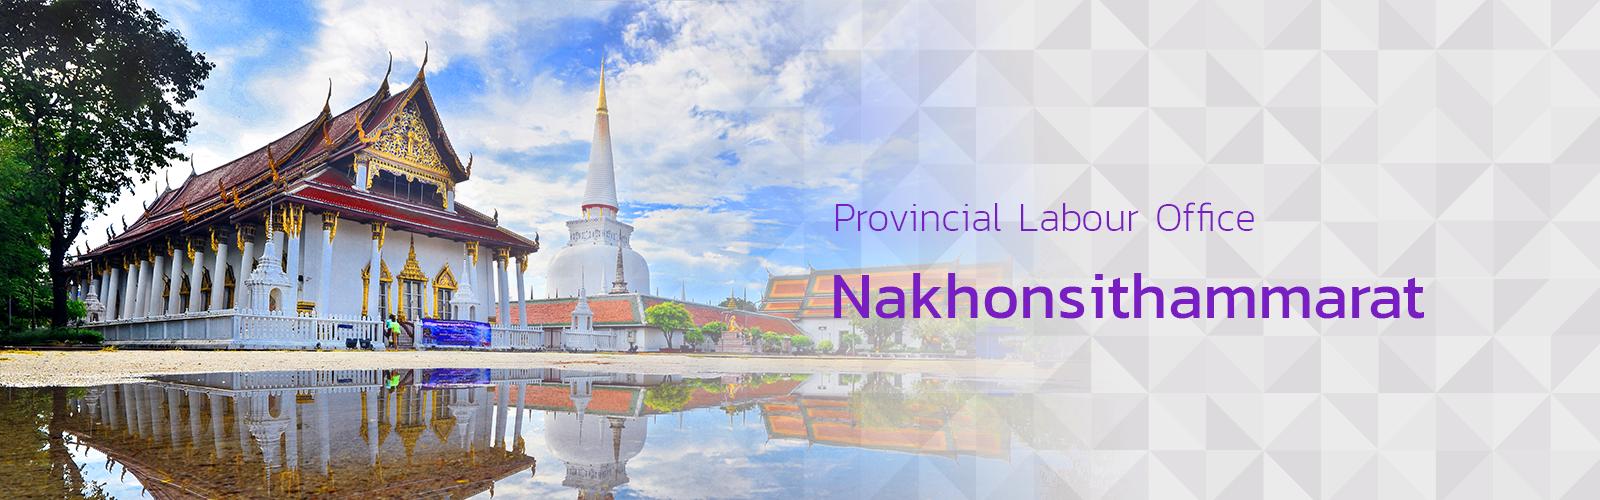 Provincial Labour Office Nakhonsithammarat